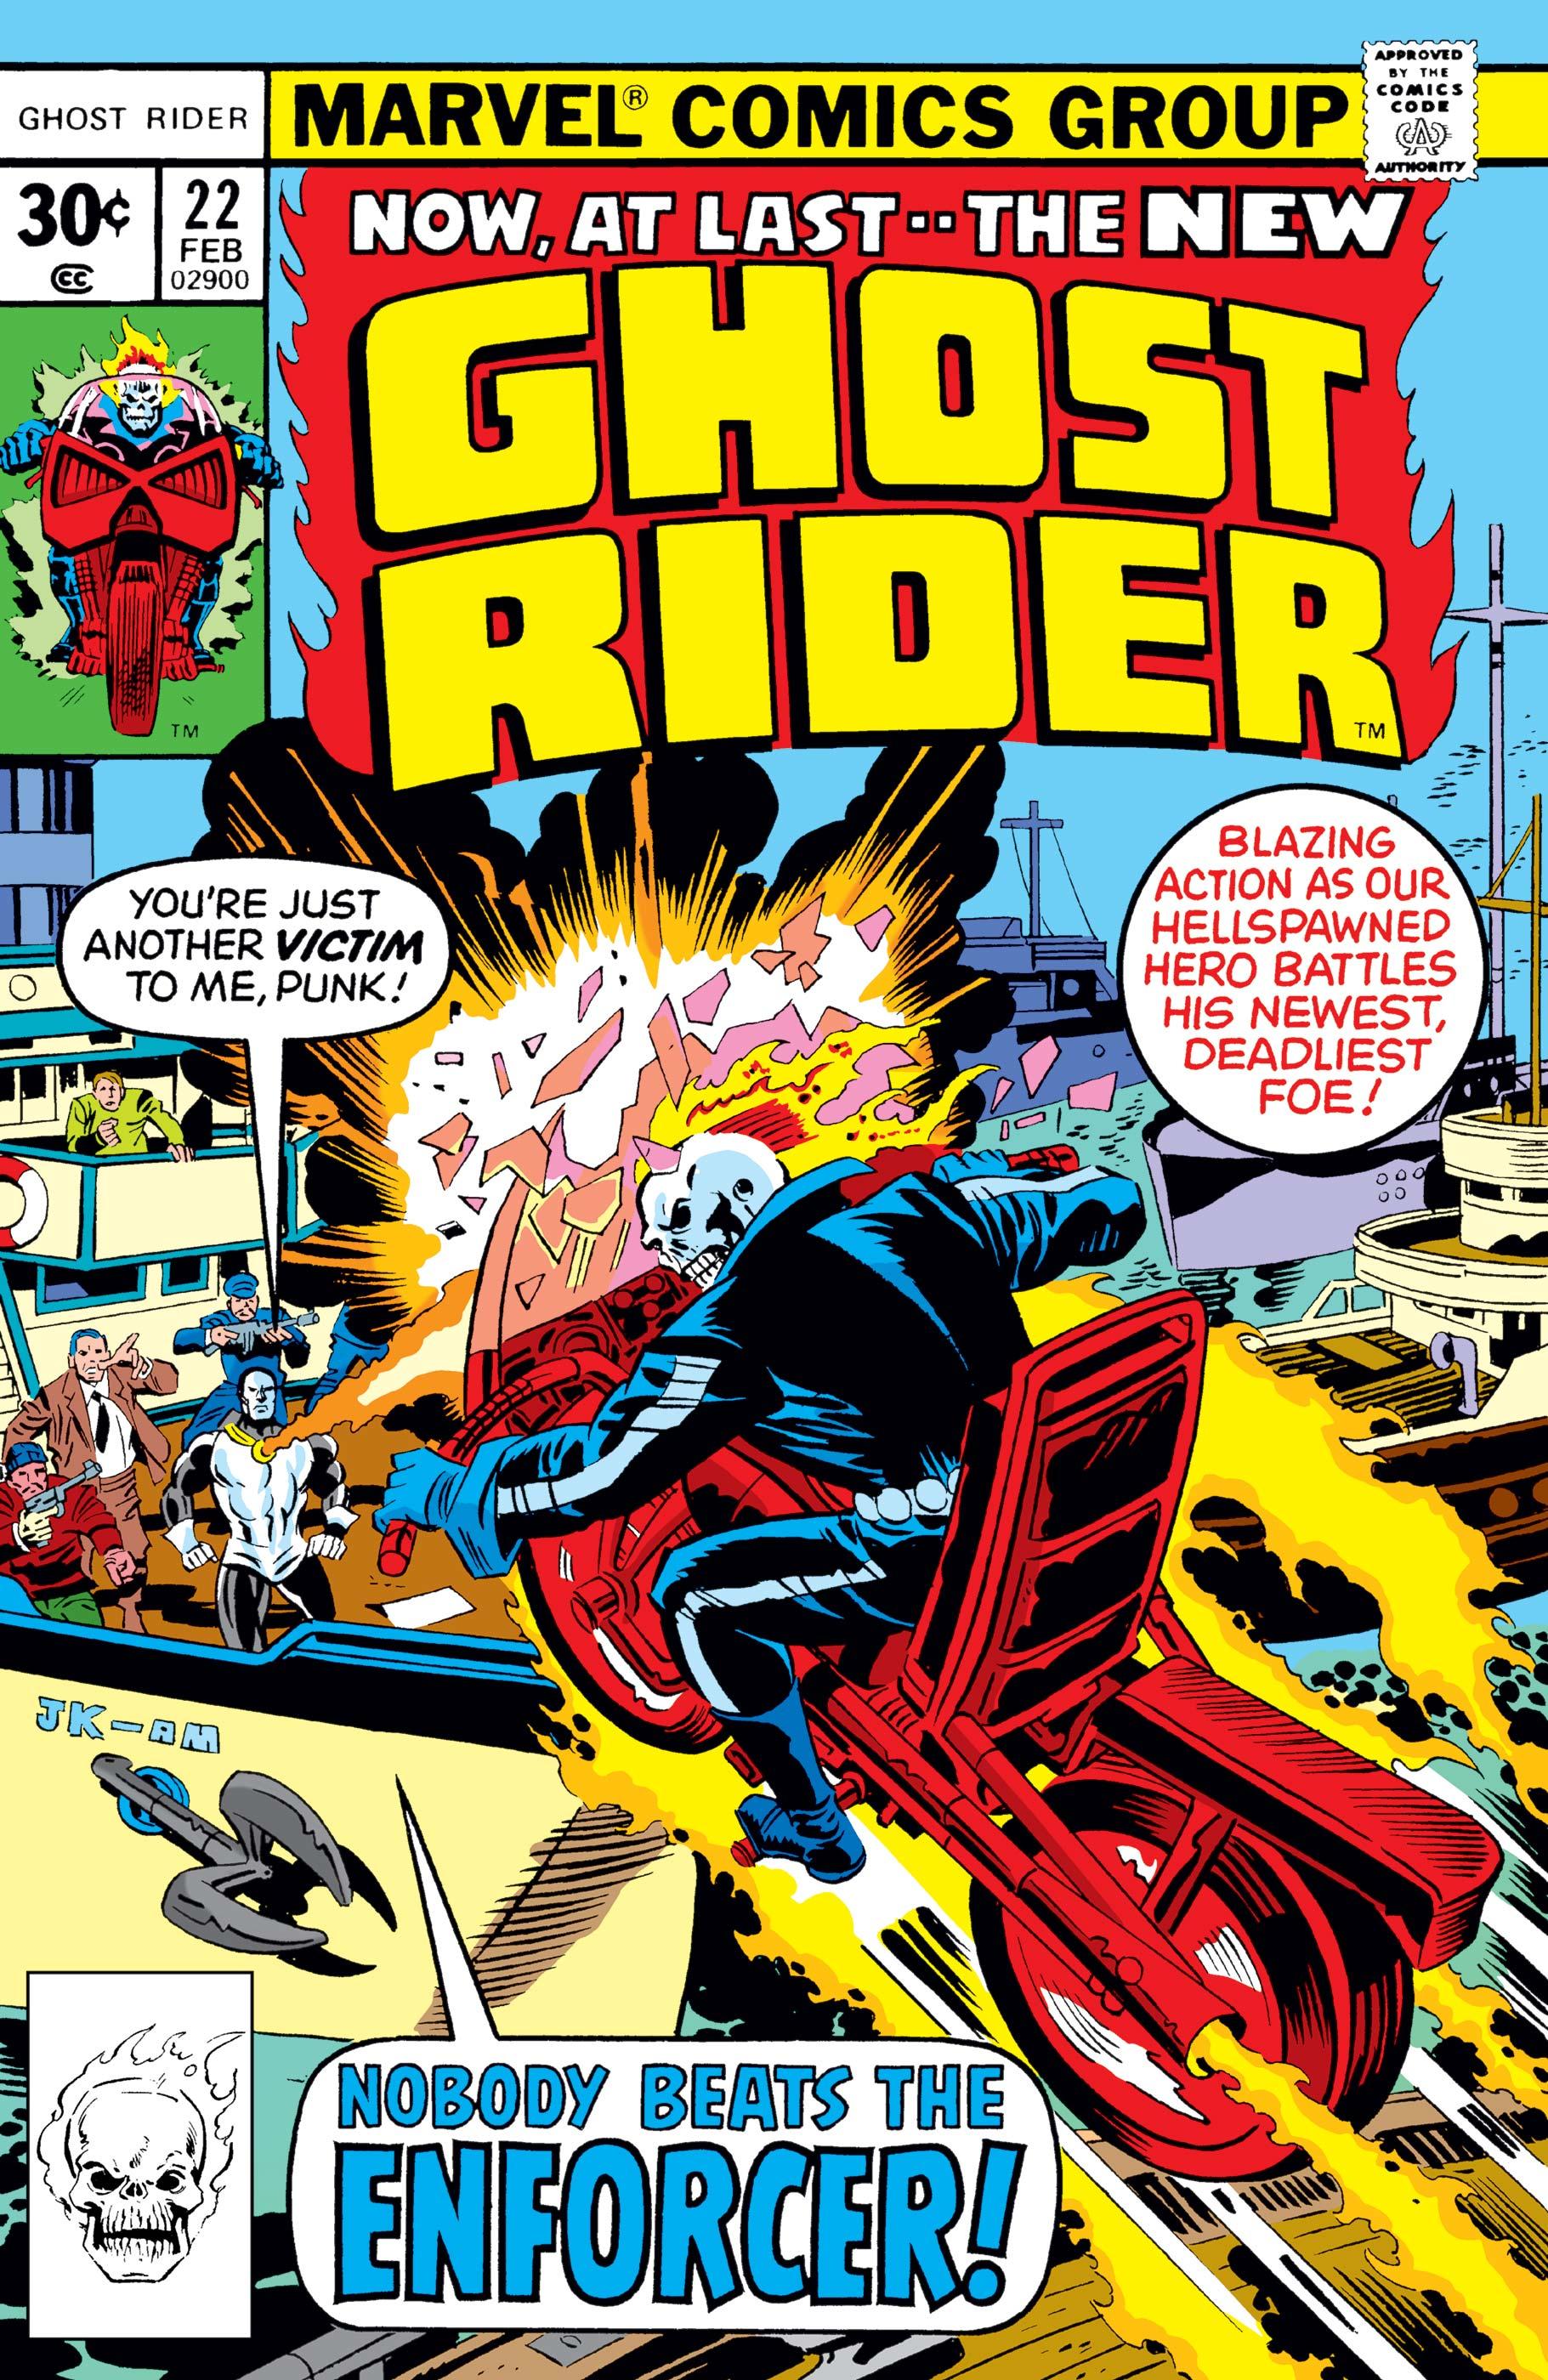 Ghost Rider (1973) #22